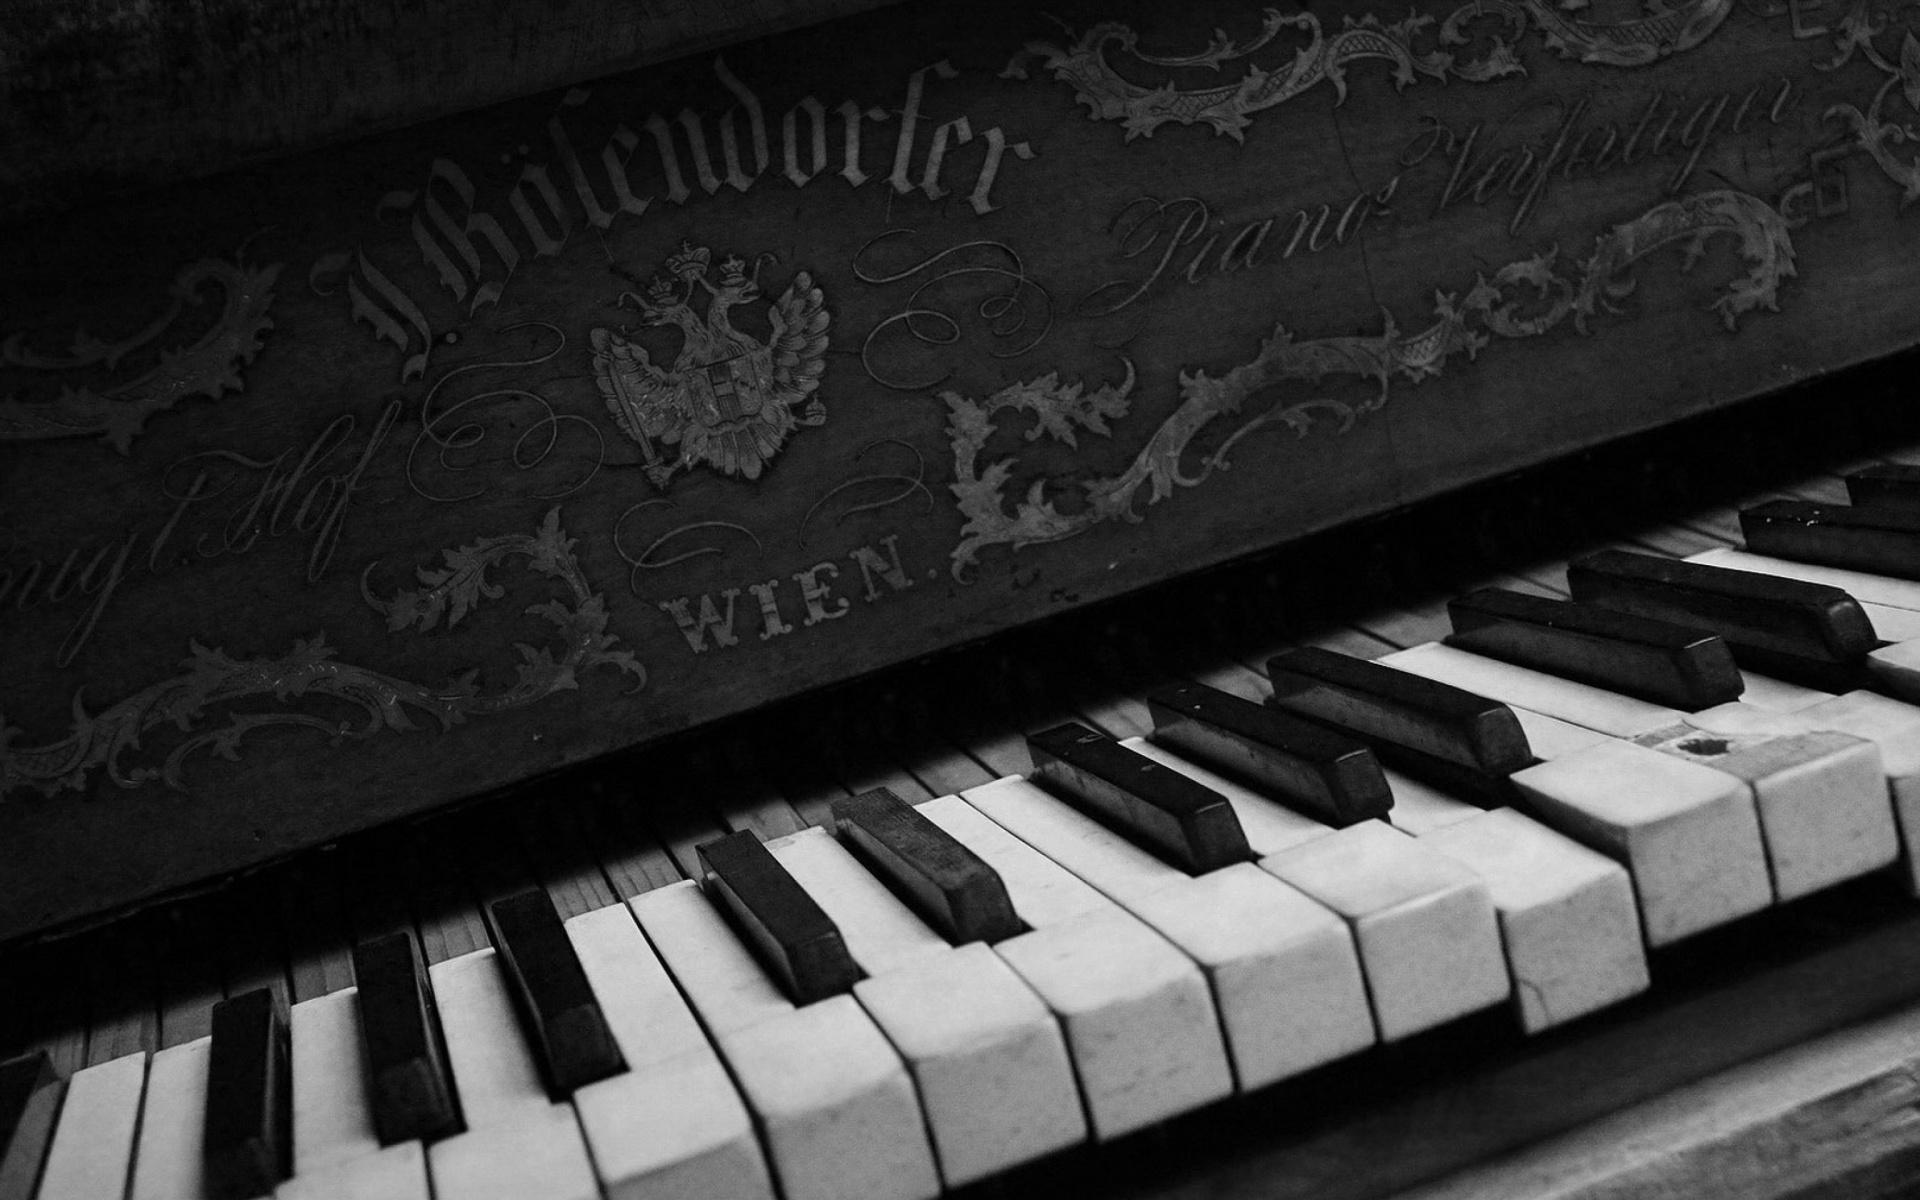 картинки фортепиано на телефон теле рурка